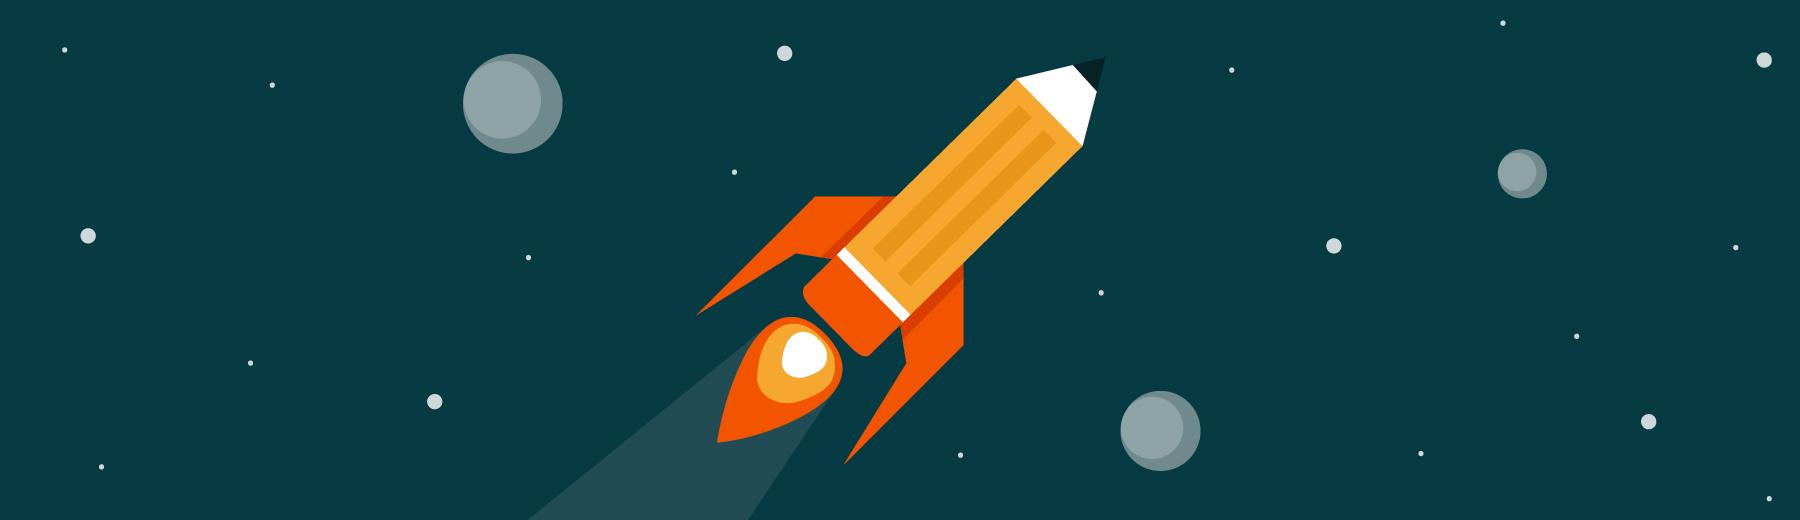 7 pro tips for content creators from content creators | Brafton